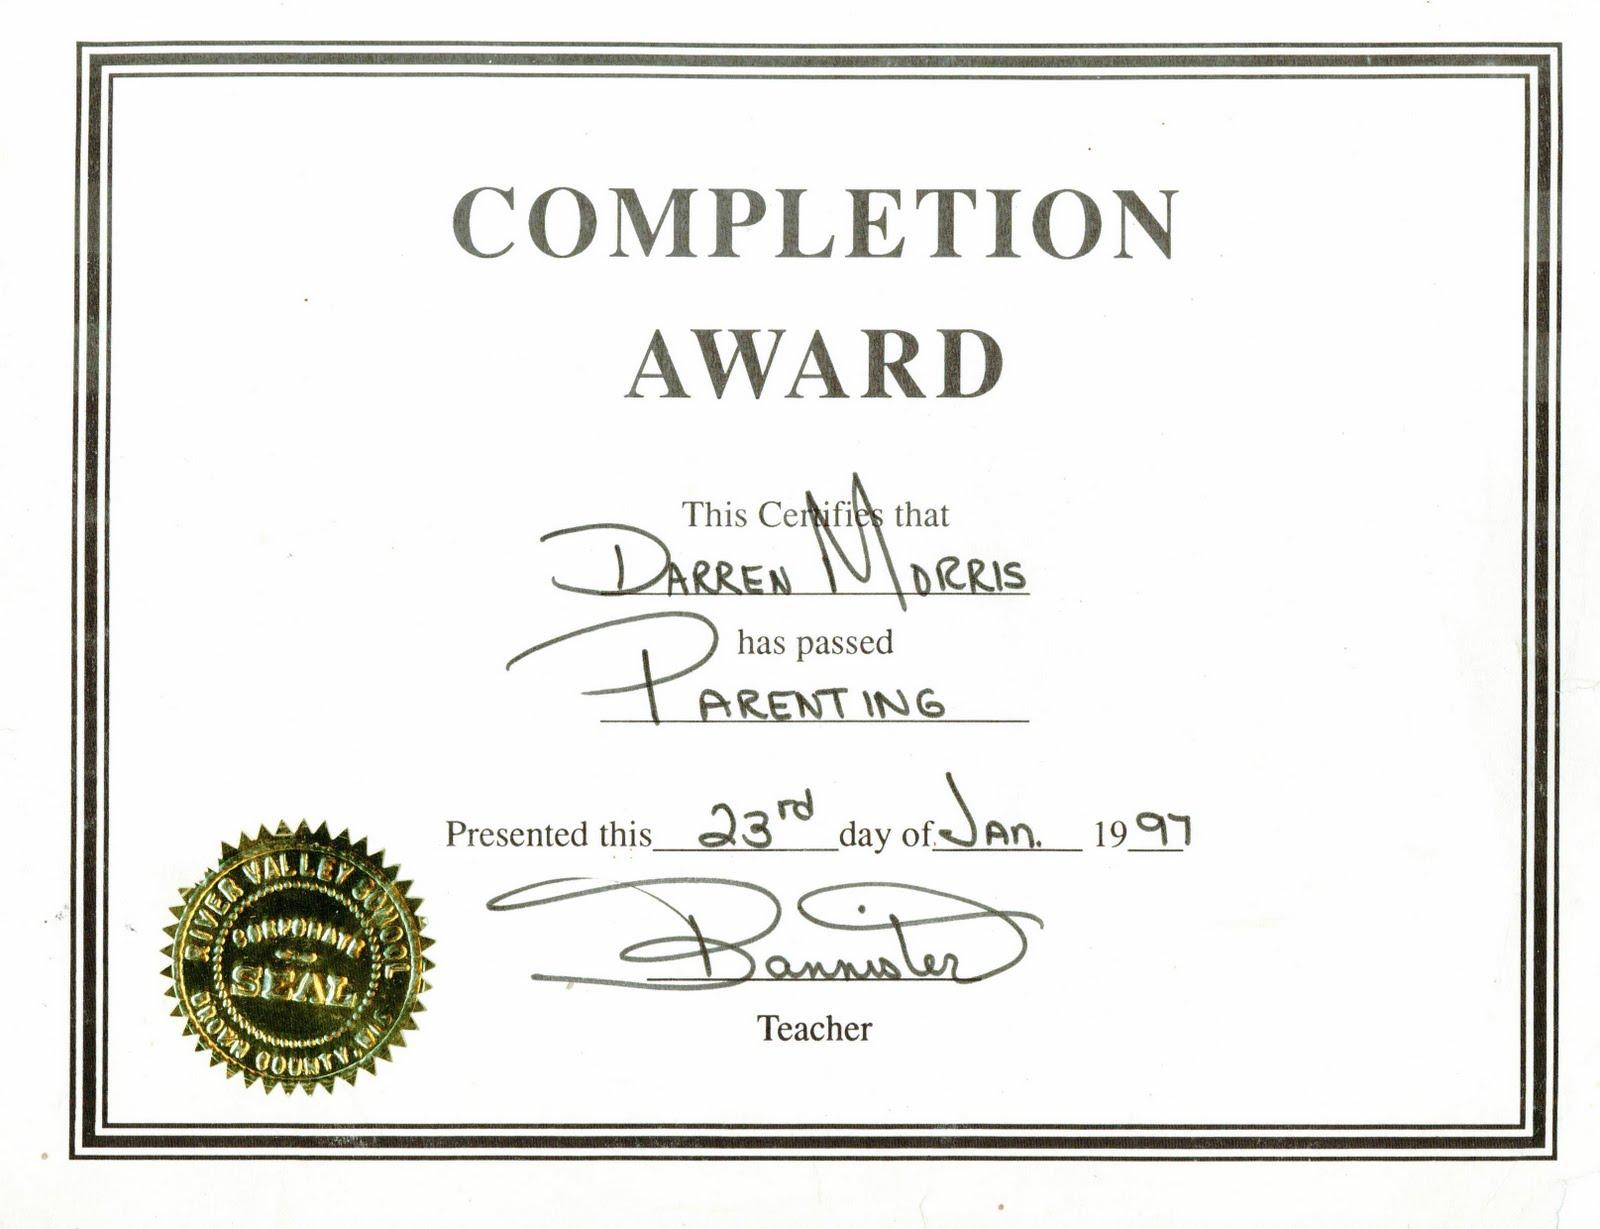 Art award certificate template fieldstation art award certificate template yelopaper Choice Image